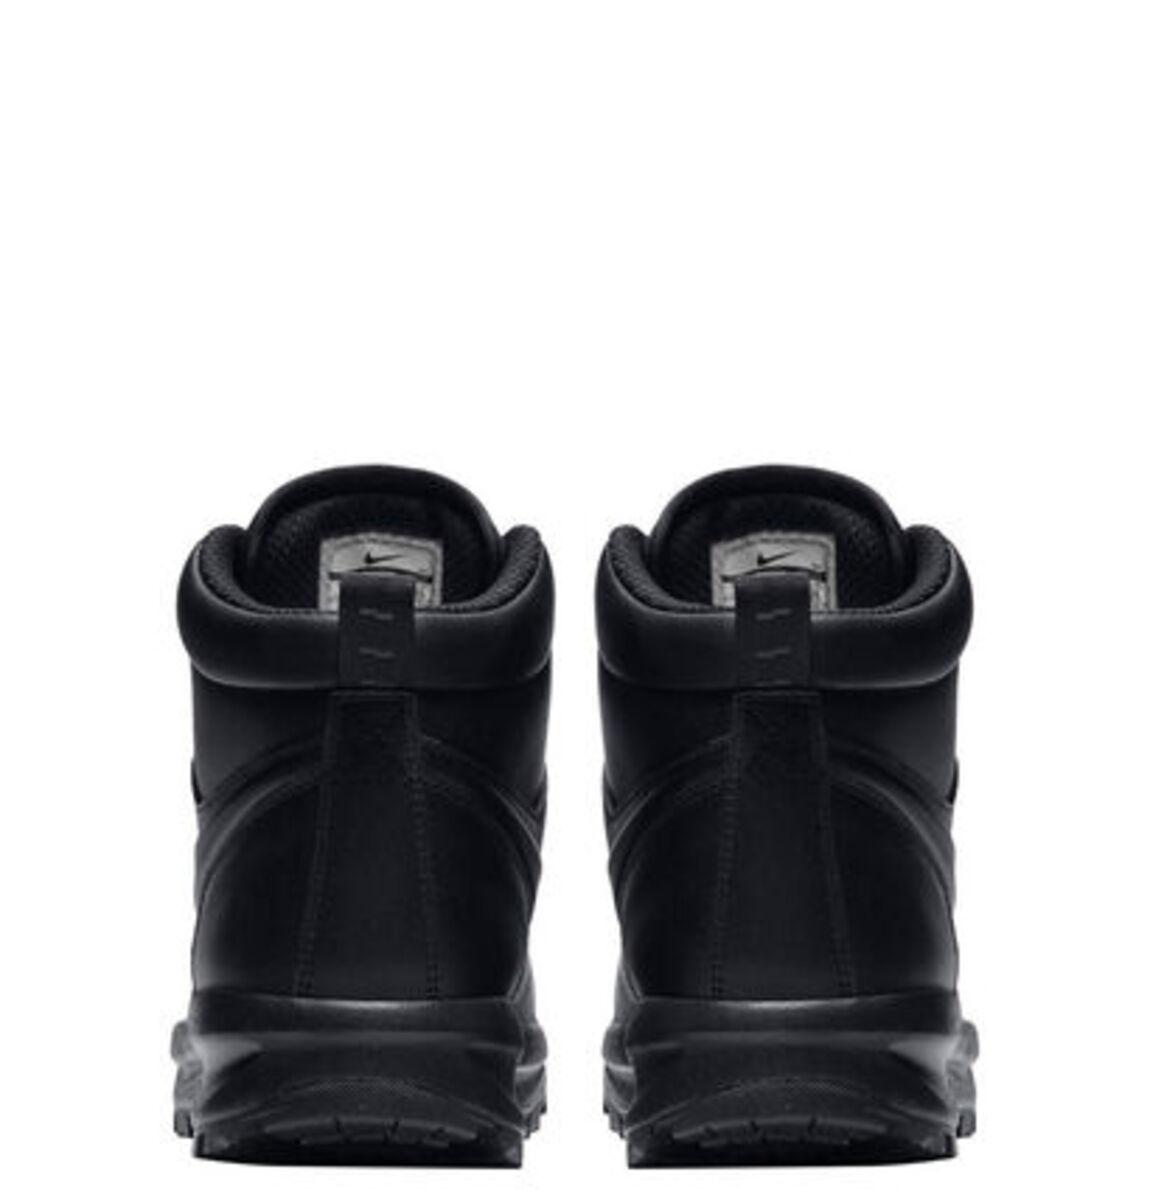 Bild 4 von Nike Herren Boots Manoa, schwarz, 41, 41